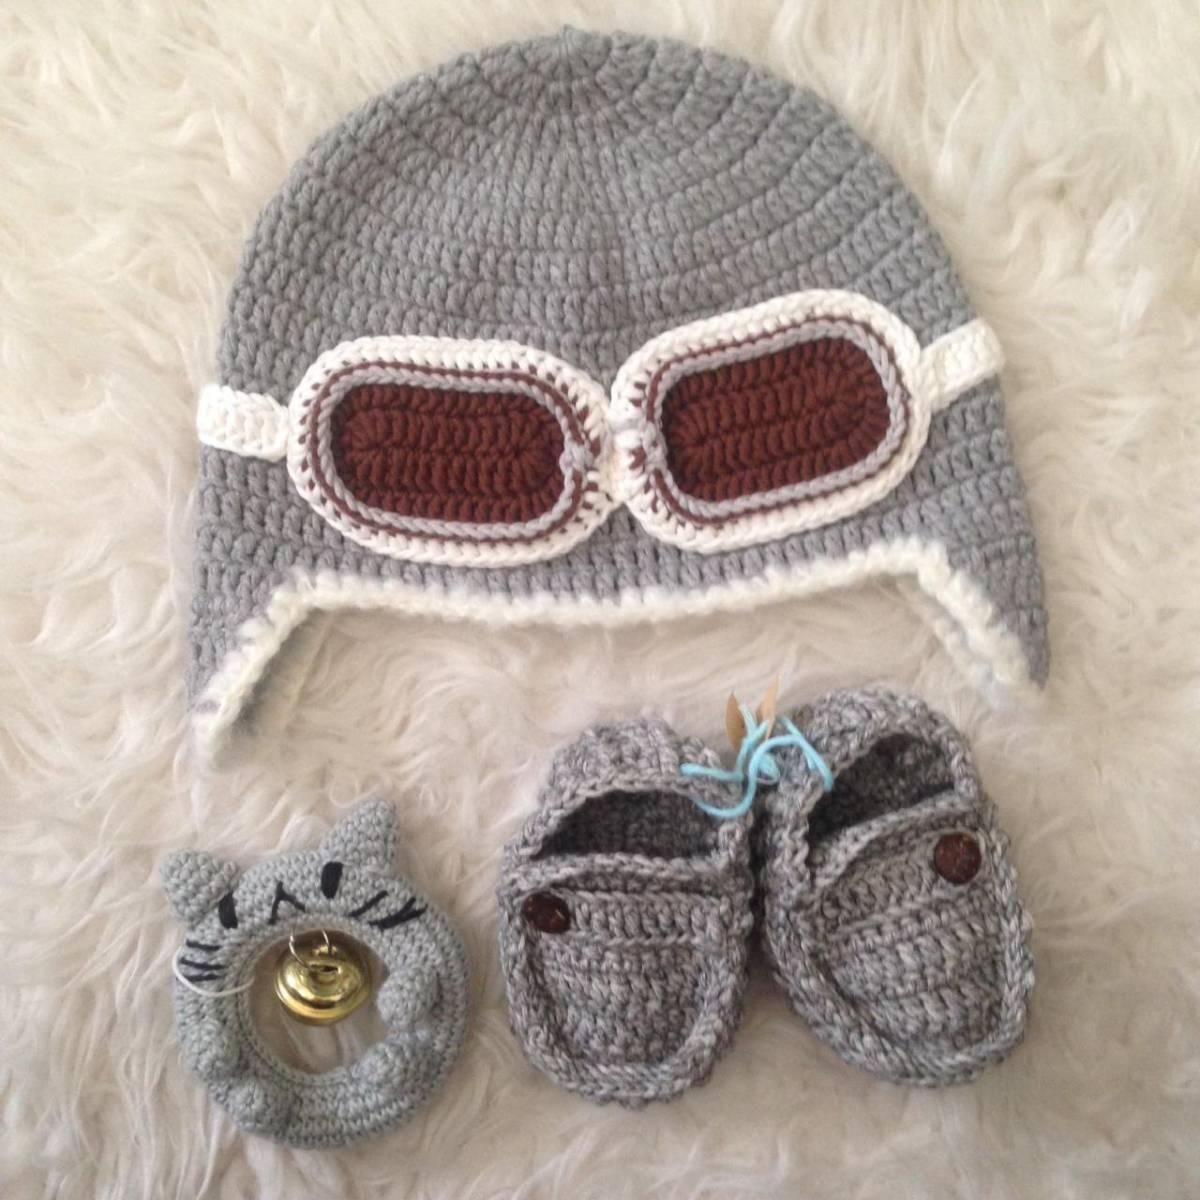 Set Rajut Bayi Topi, Sepatu Dan Rattle0